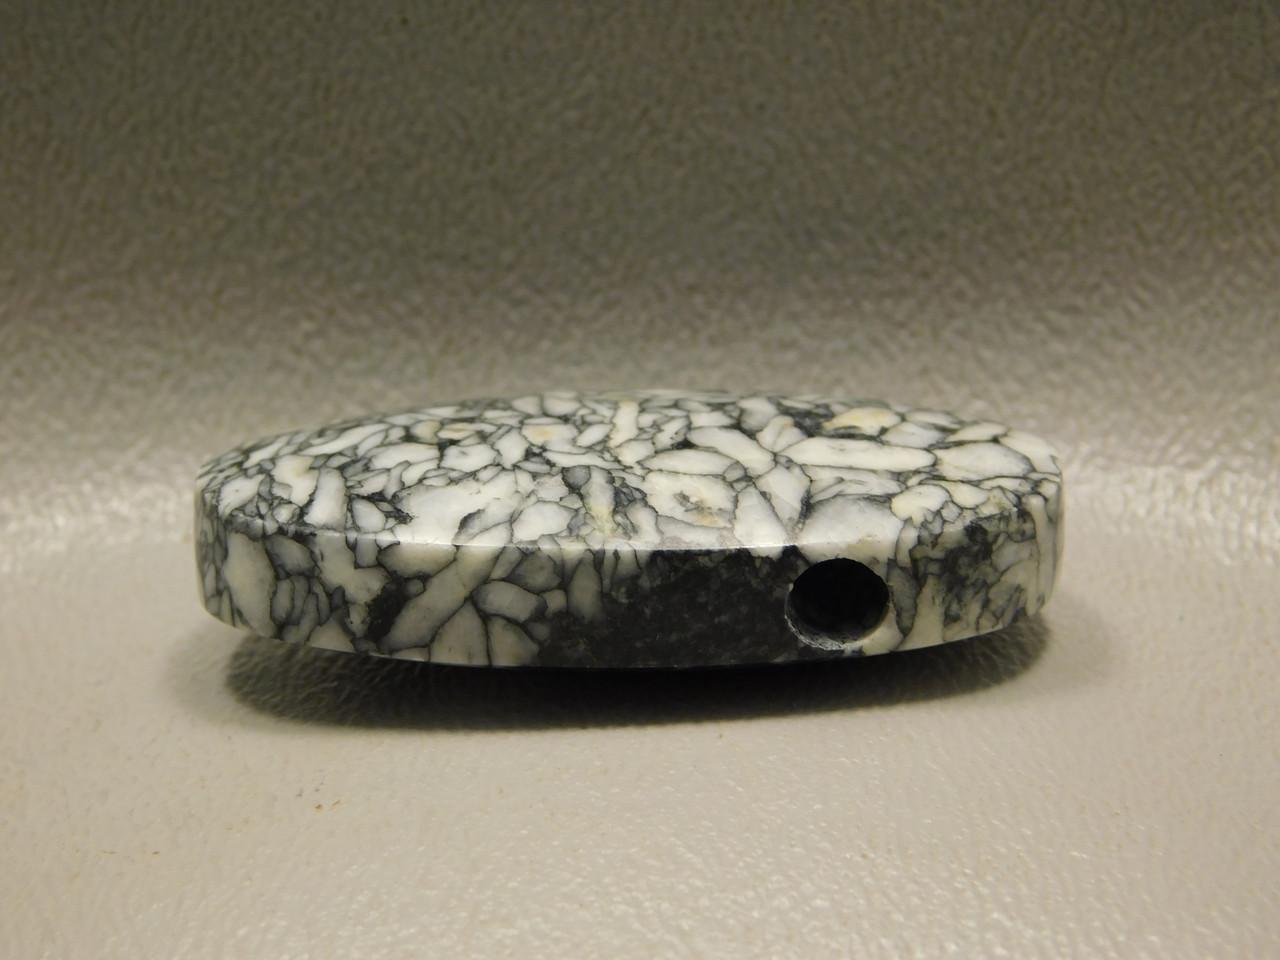 Pinolith Stone Bead Pendant #6